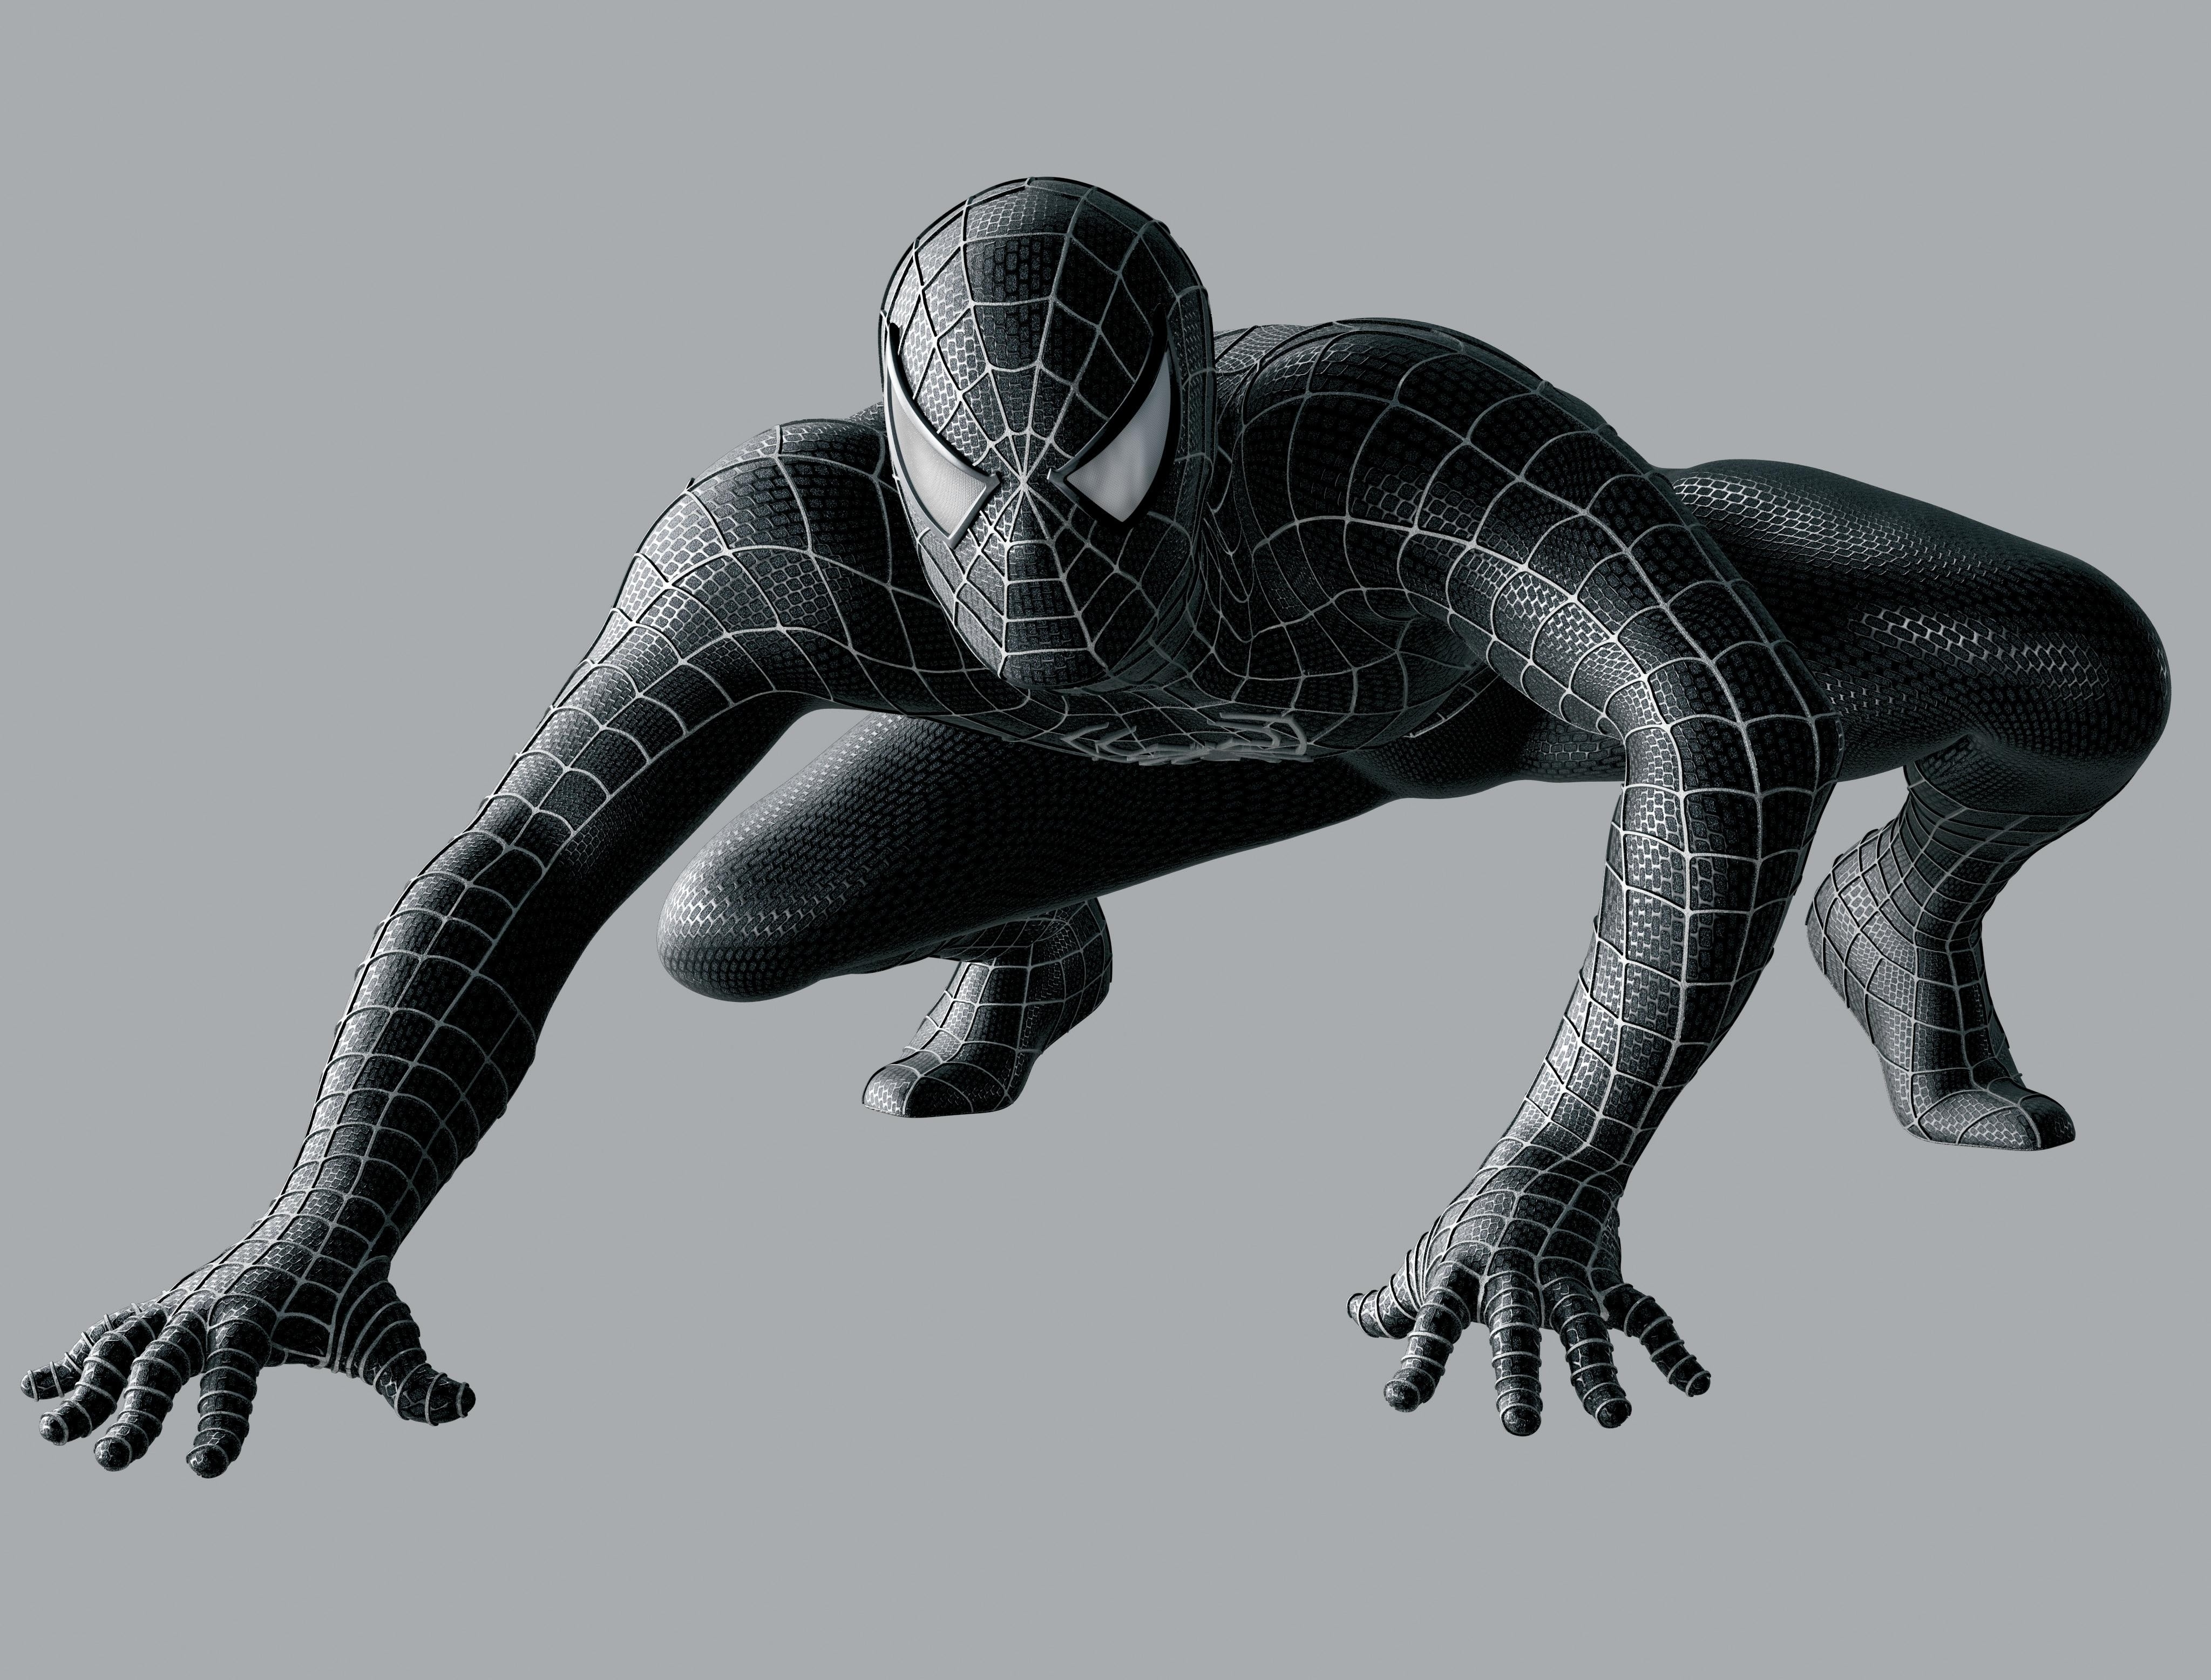 wallpaper.wiki-black-spiderman-iphone-image-hd-pic-wpd0011555